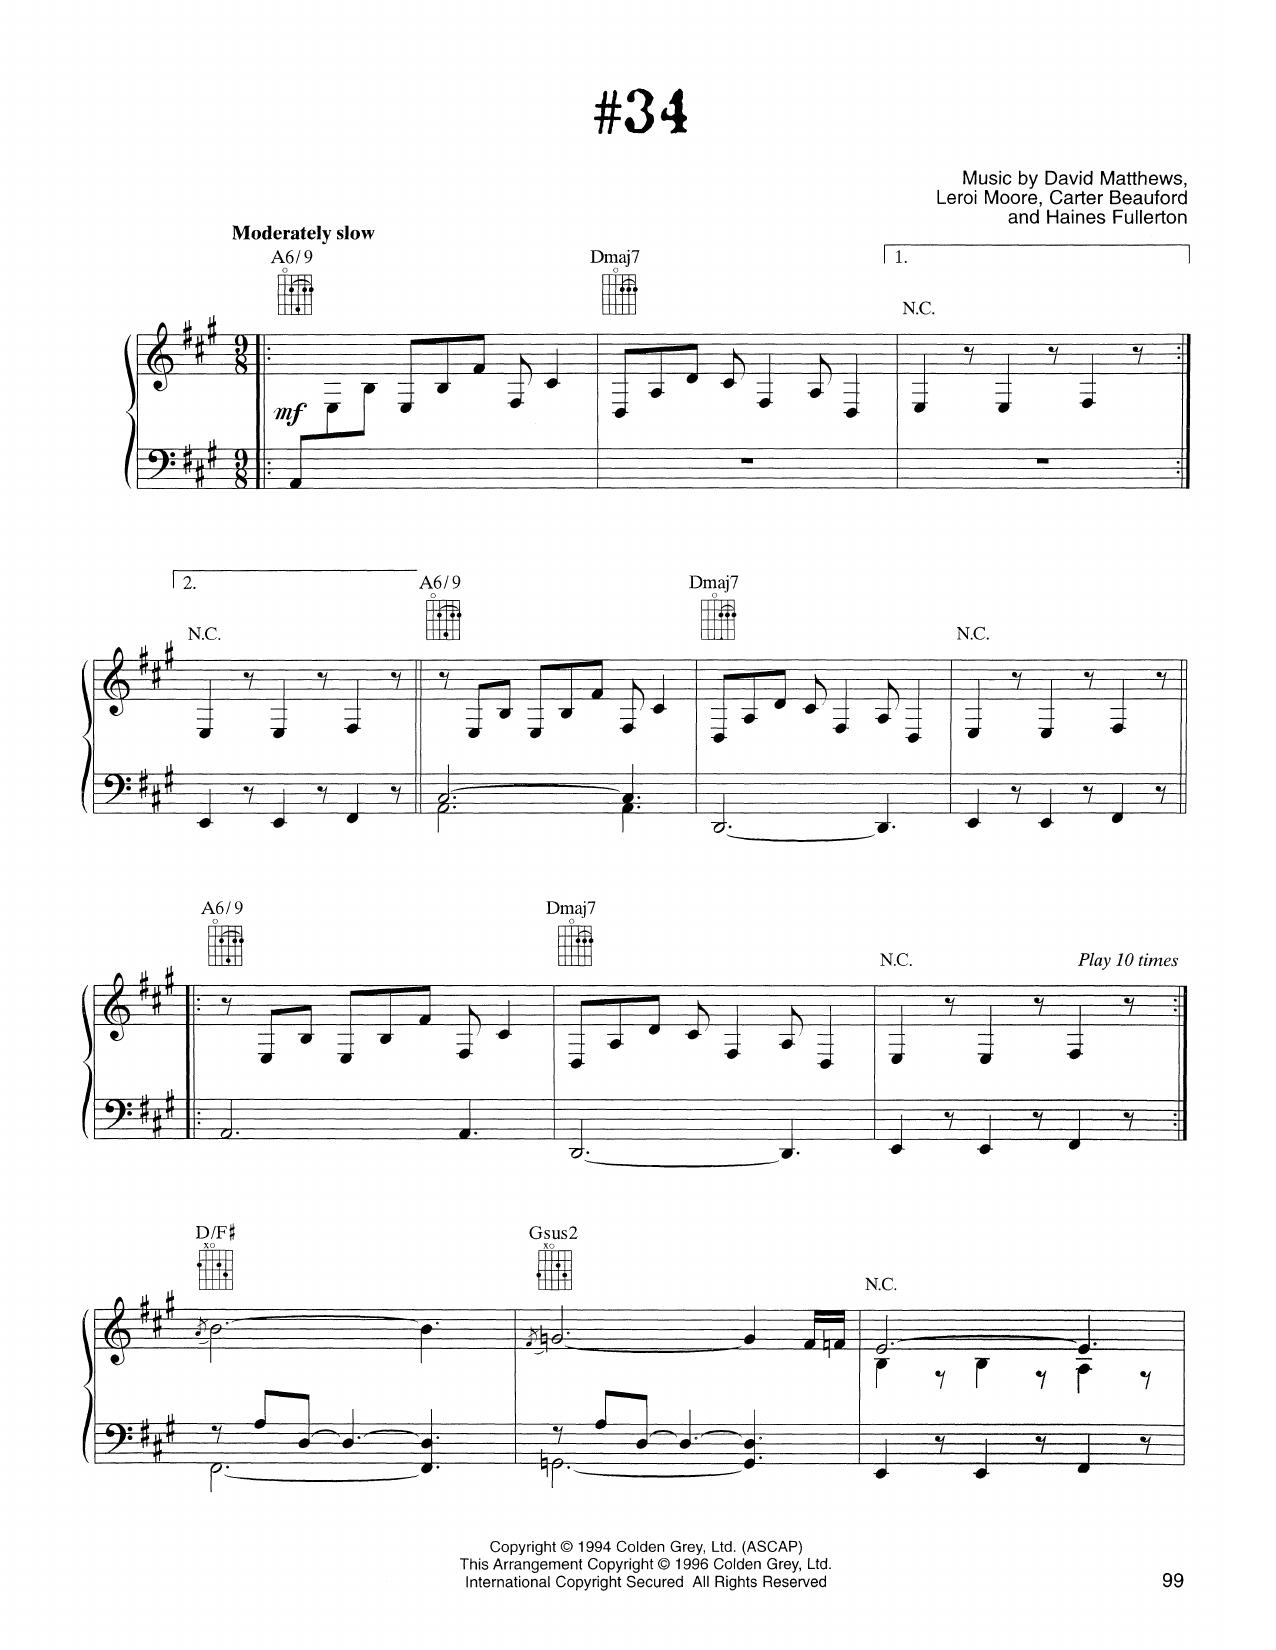 Dave Matthews Band - #34